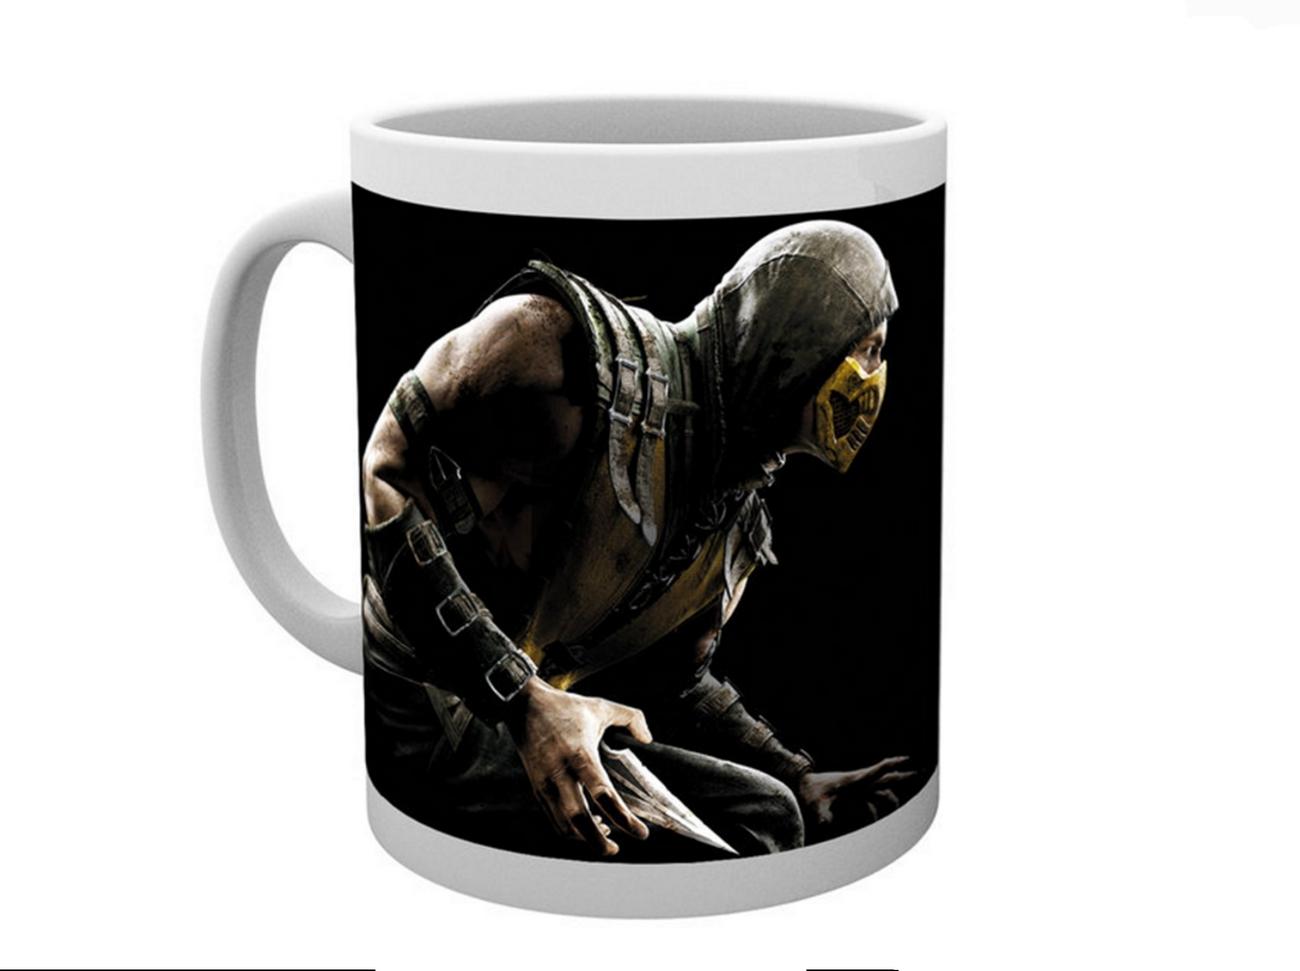 MORTAL KOMBAT - Mug Scorpion - 320ml